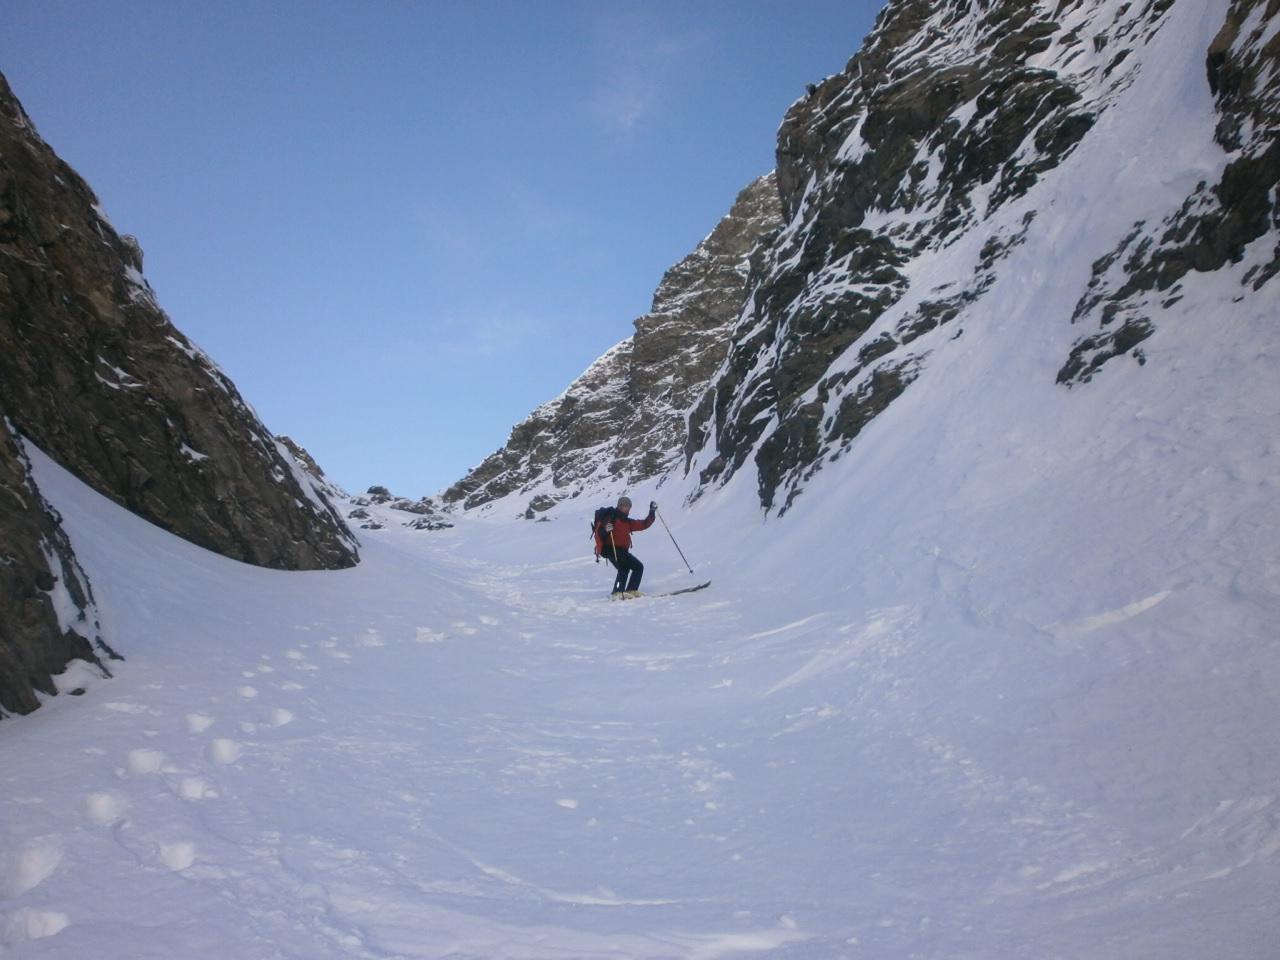 Alp (Punta de l') o Pic de Caramantran Canale NE 2014-11-08